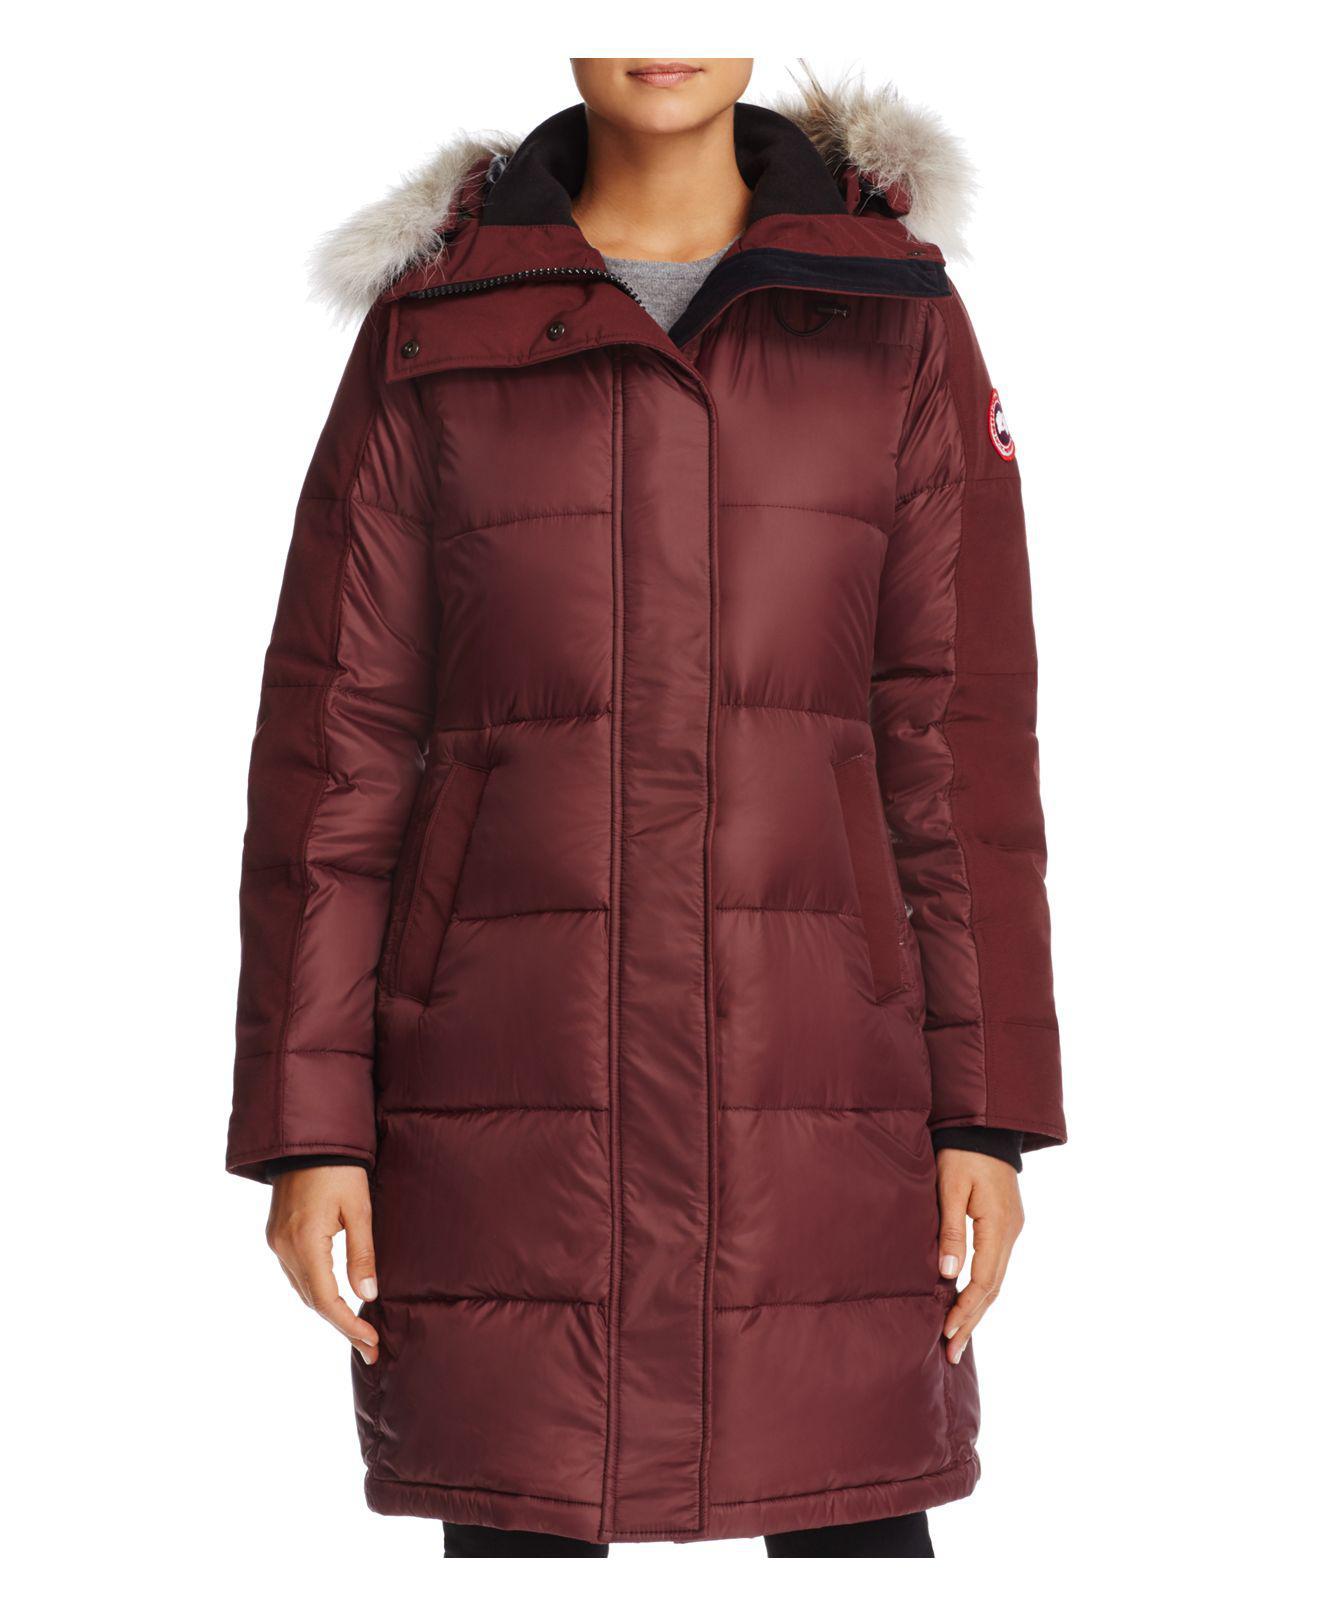 ... Kensington; Canada goose Rowley Fur Trim Down Parka in Red Lyst